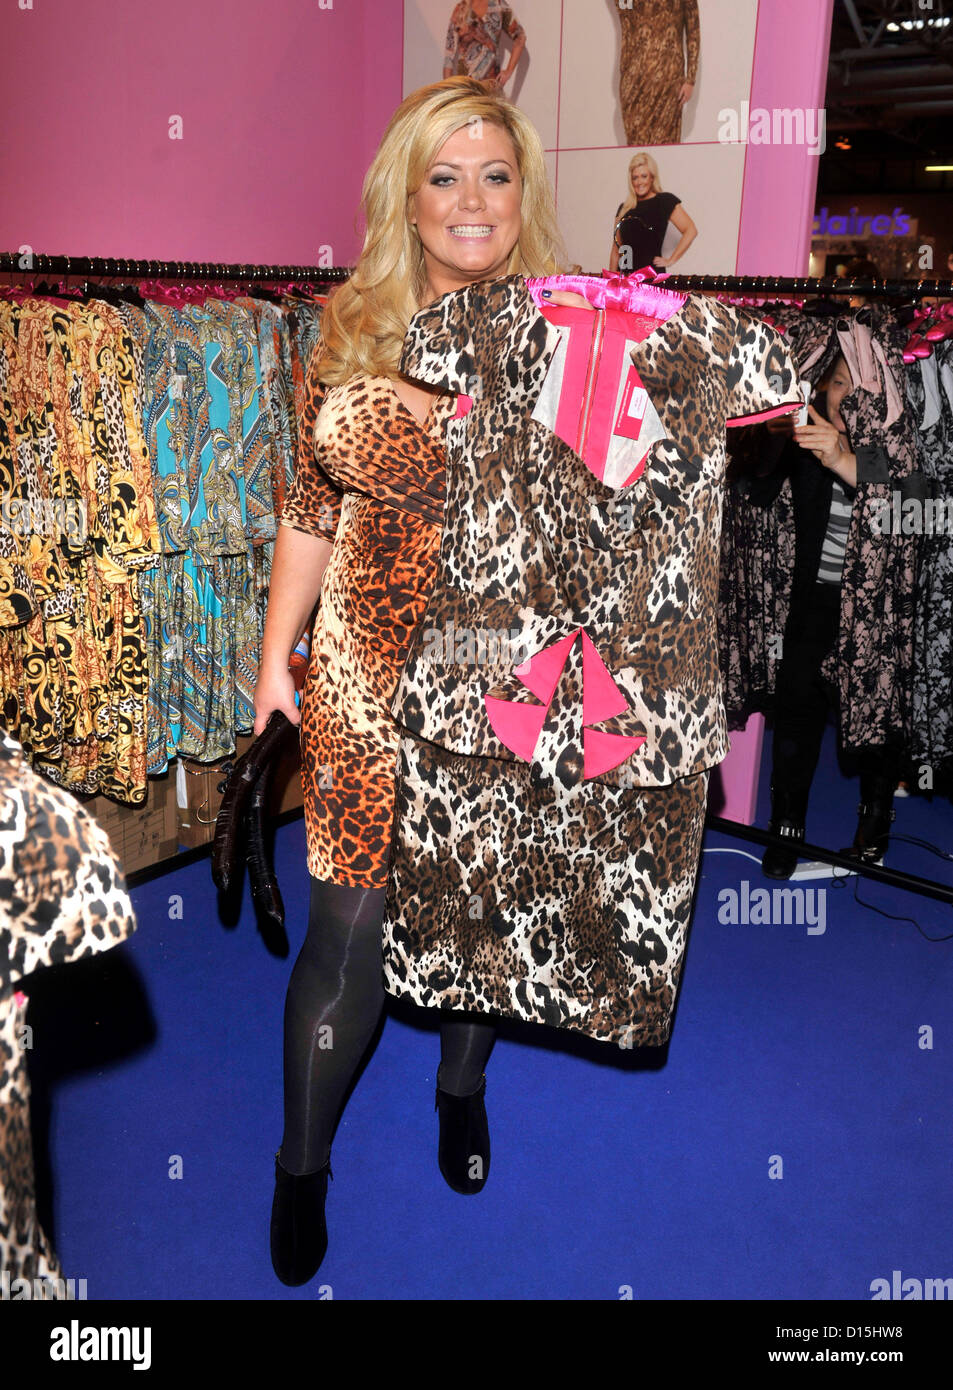 db8c2c3da0790 Gemma Collins Dresses Fashion World - PostParc